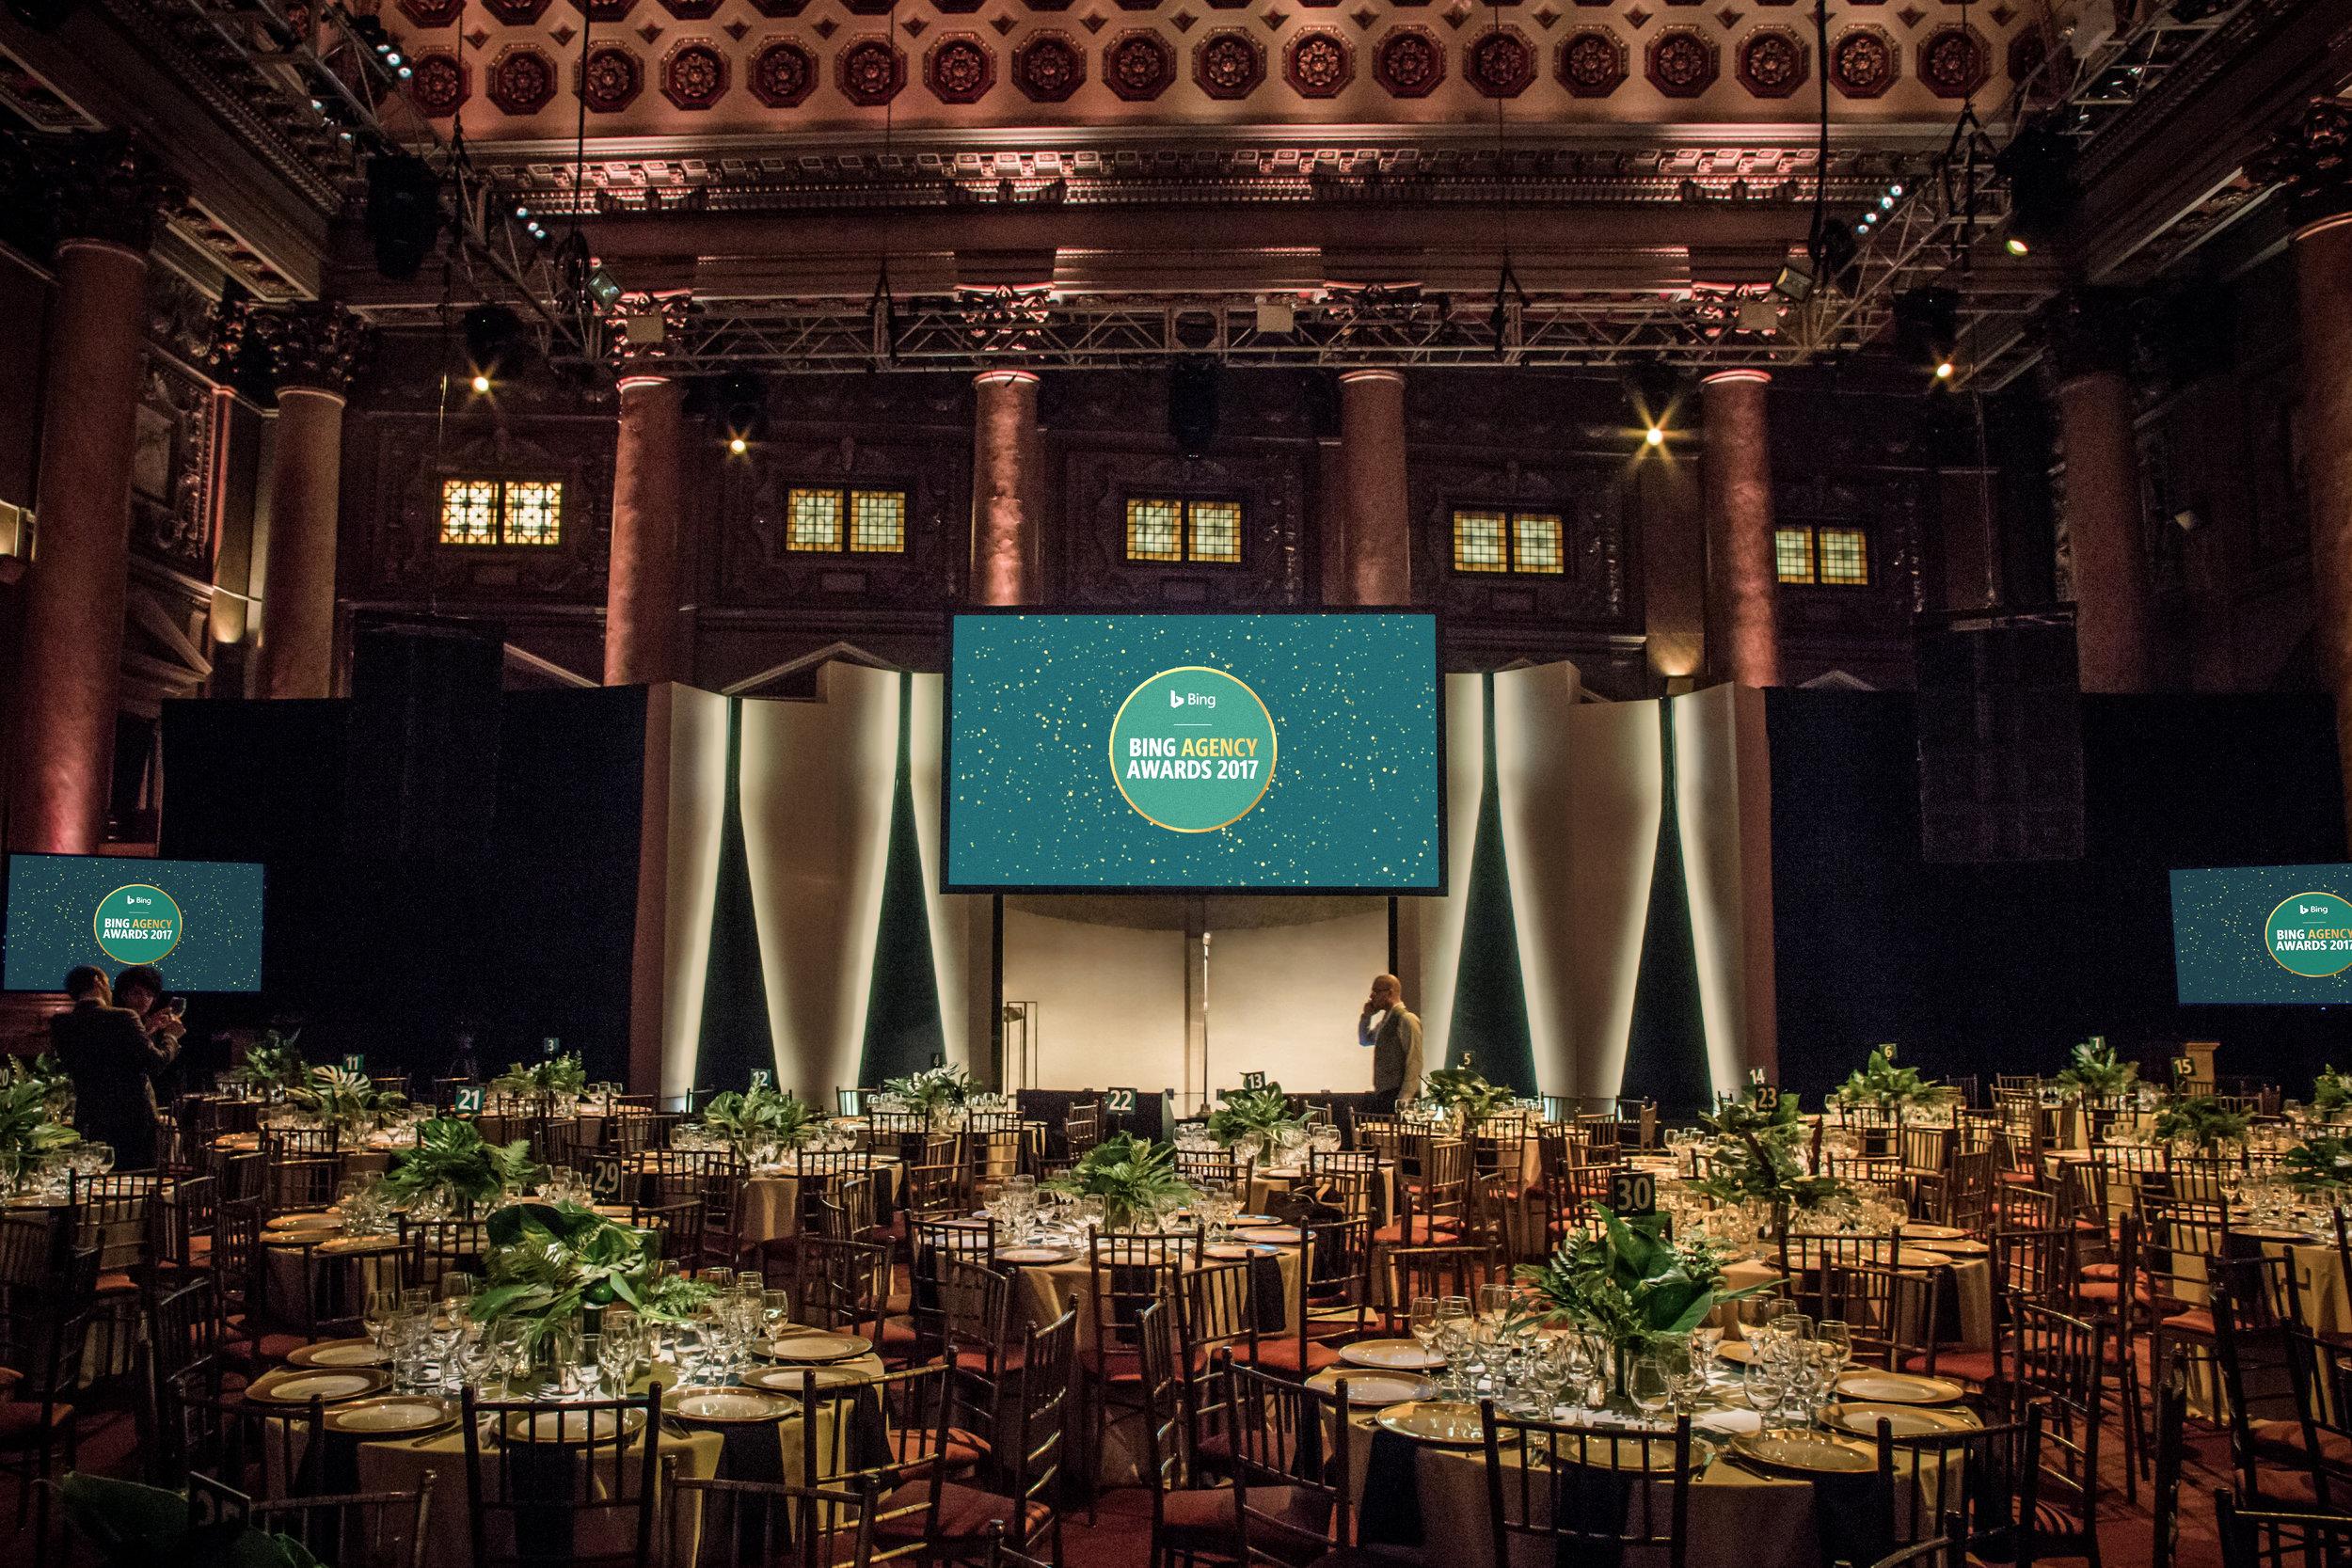 Microsoft, Bing, Agency, Awards, Creative, Production, Design, Strategy, Dinner, Trevor Noah, Shine Bright, Invisible North, B2B, Awards Ceremony